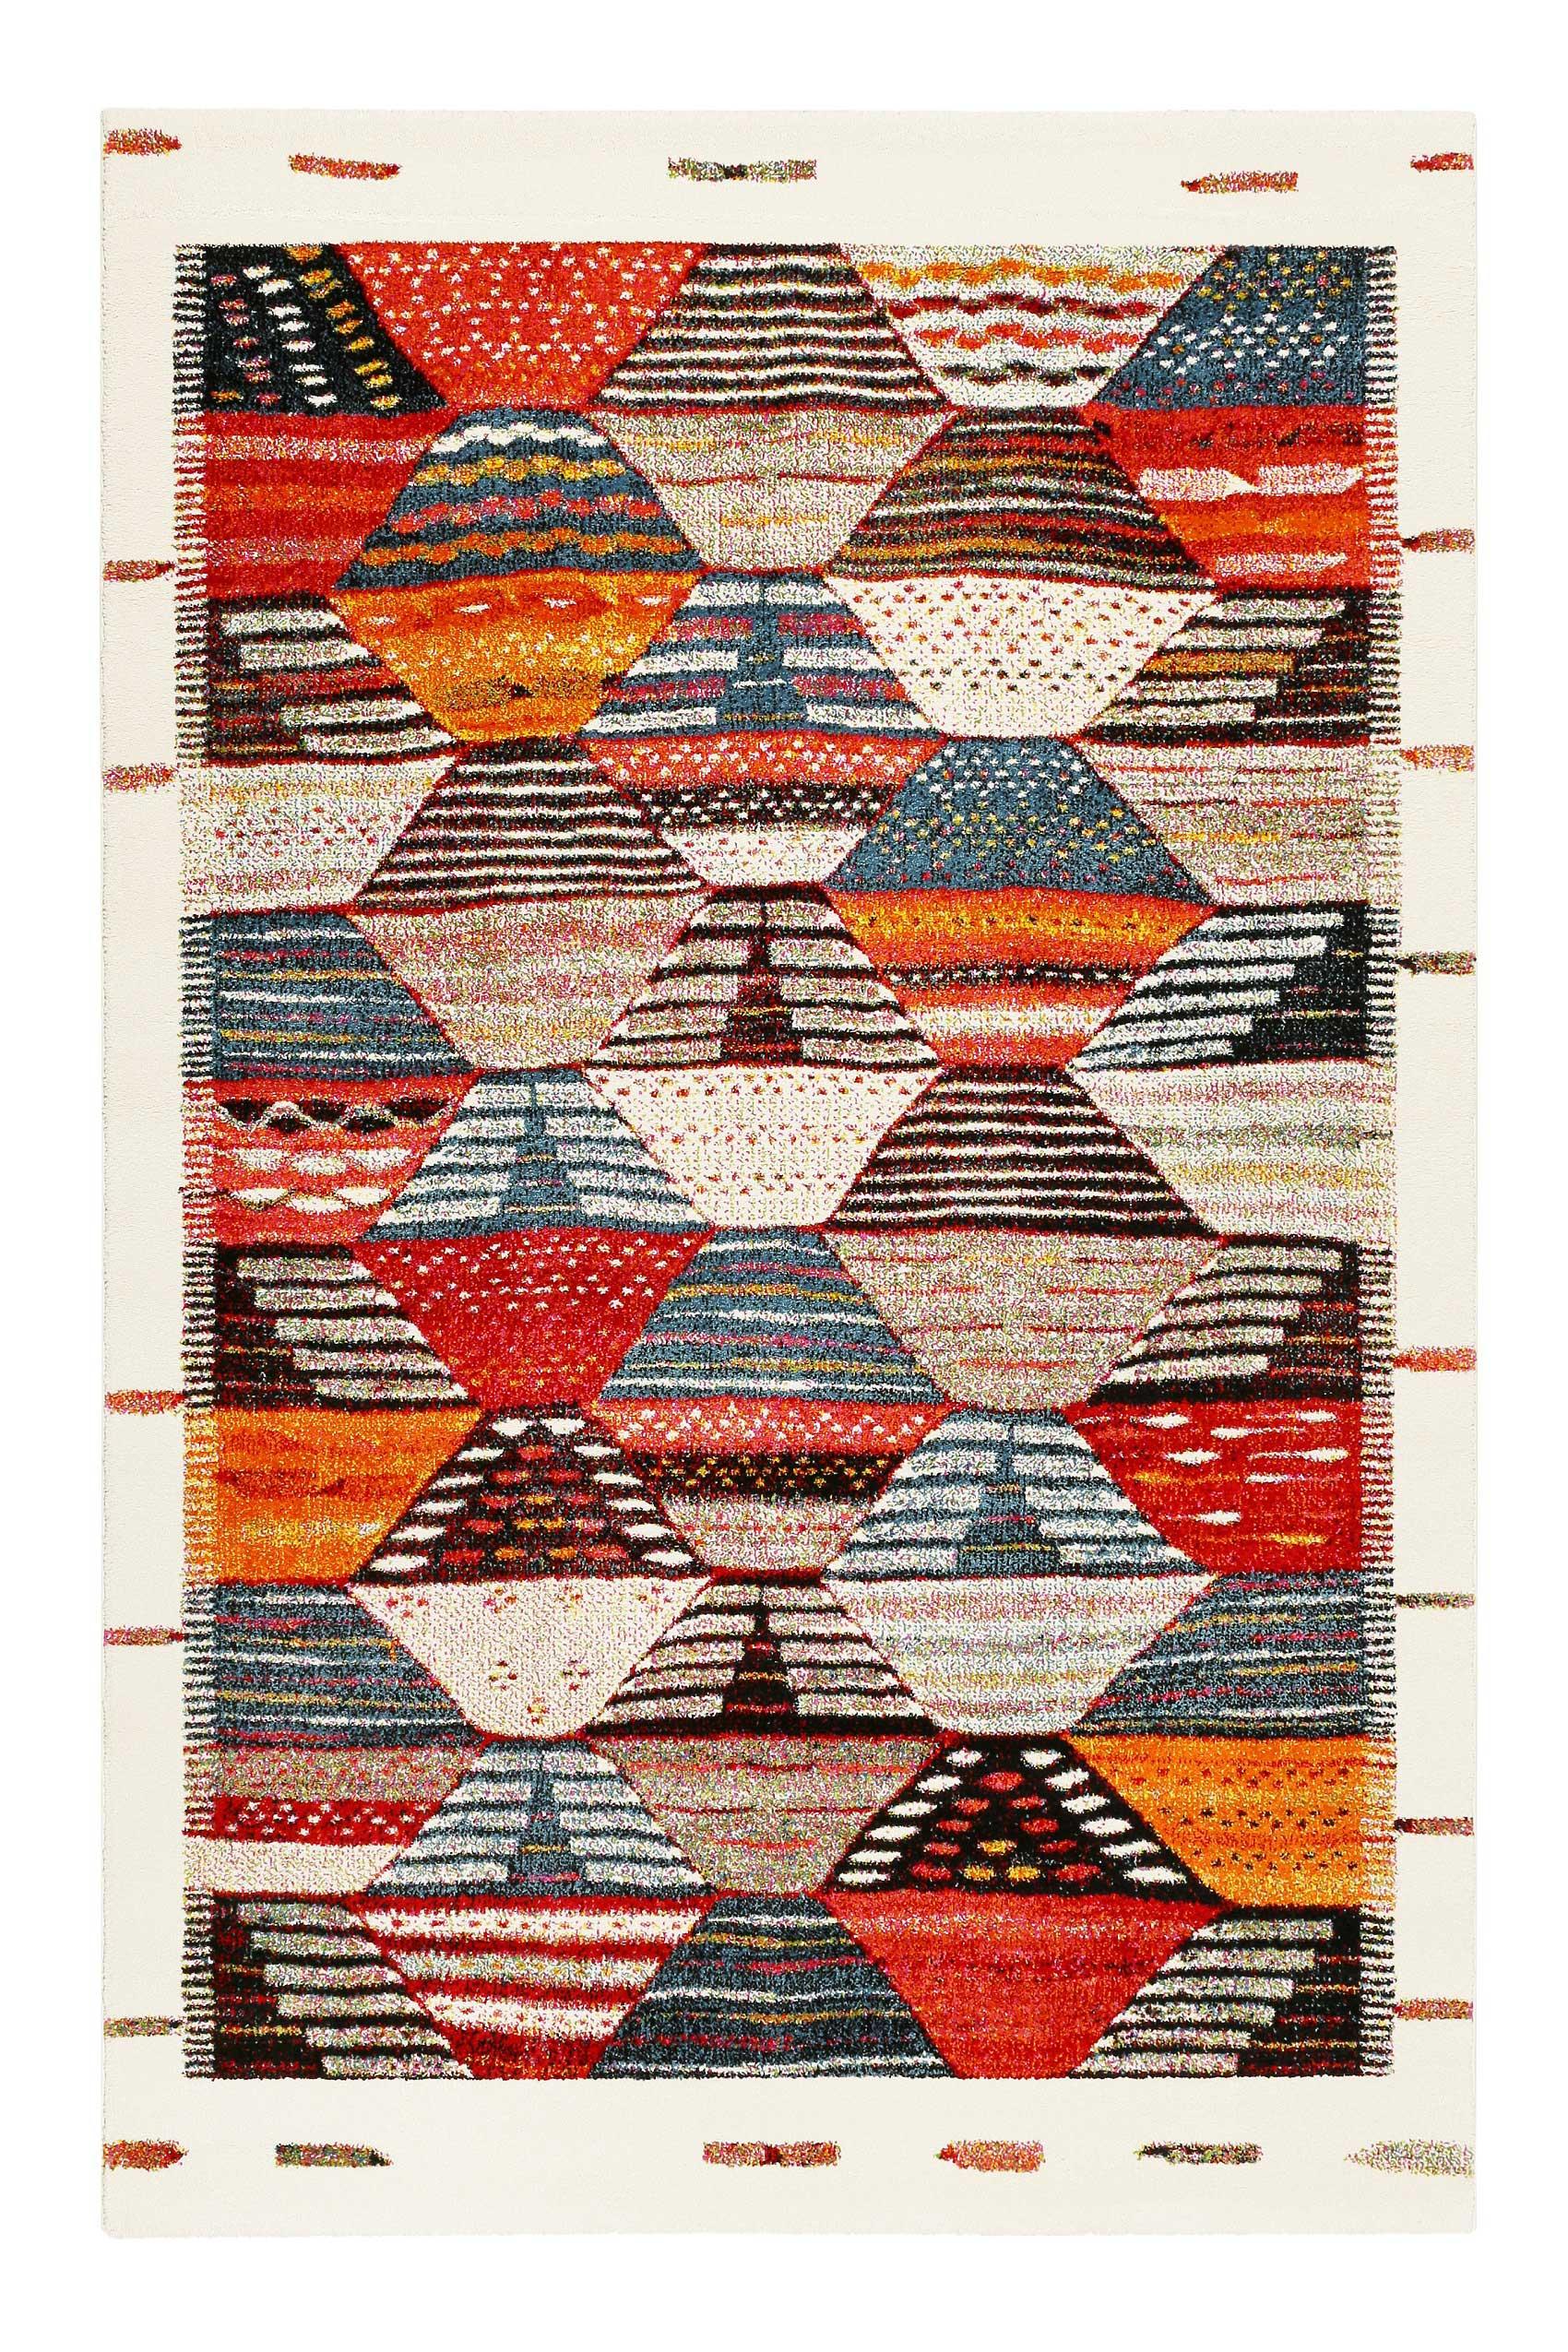 Tapis inspiration berbère multicolore pour salon, chambre 225x160